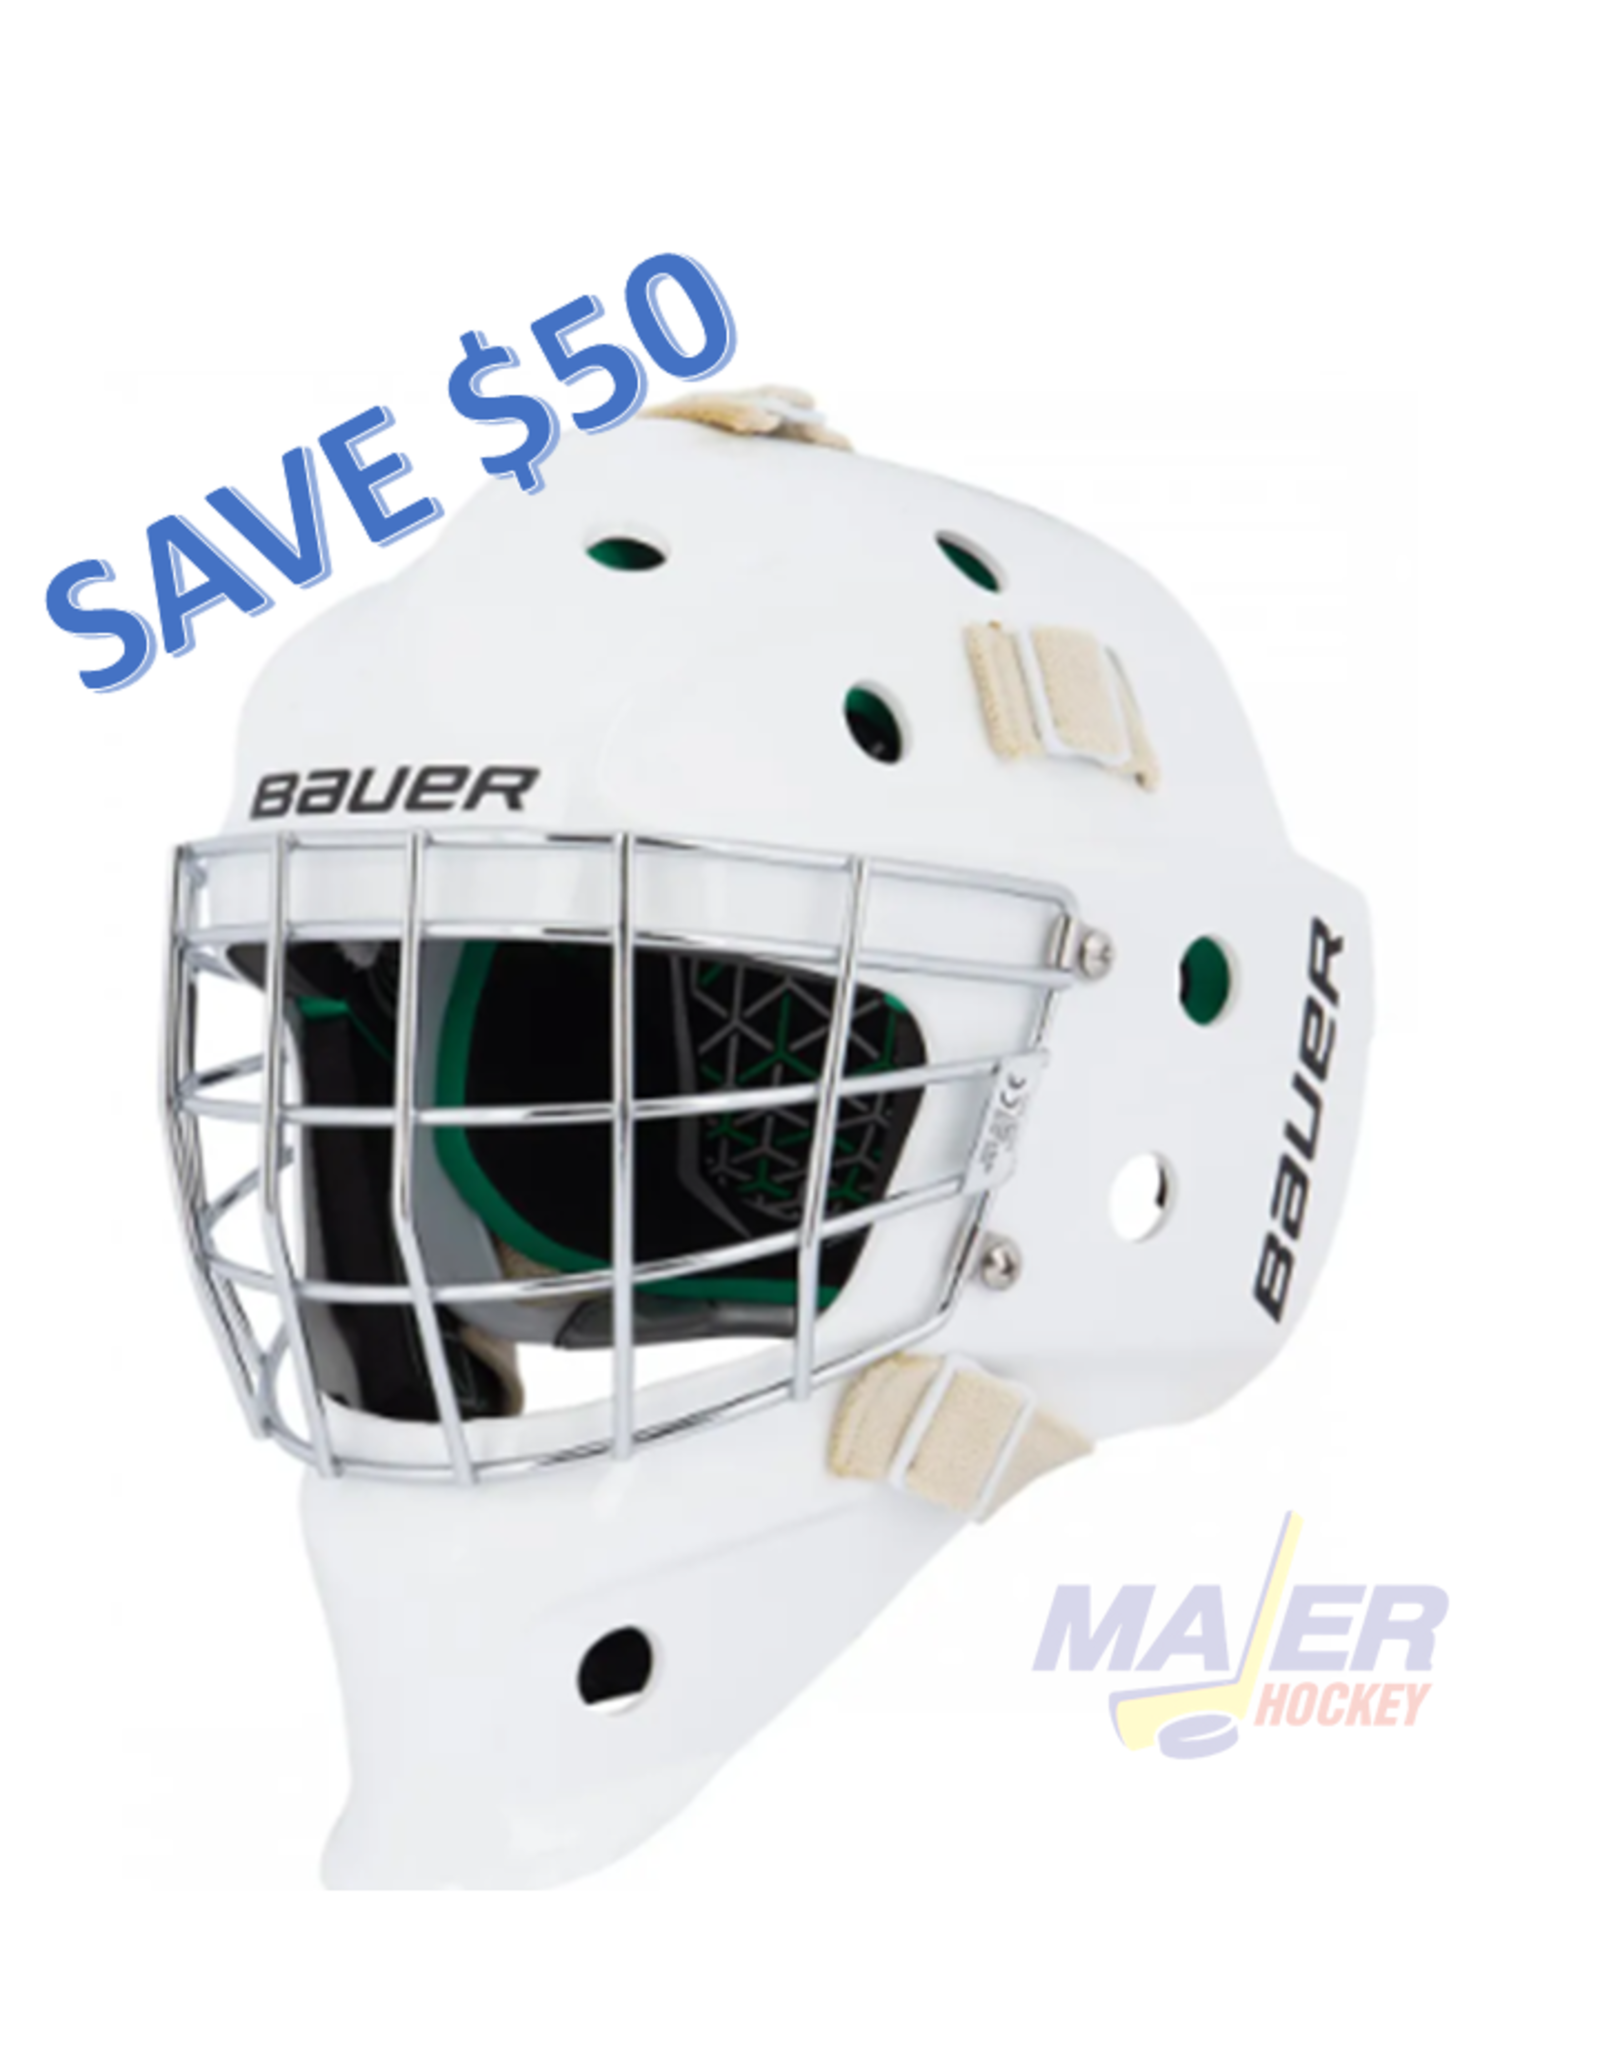 Bauer NME4 Junior Goalie Mask